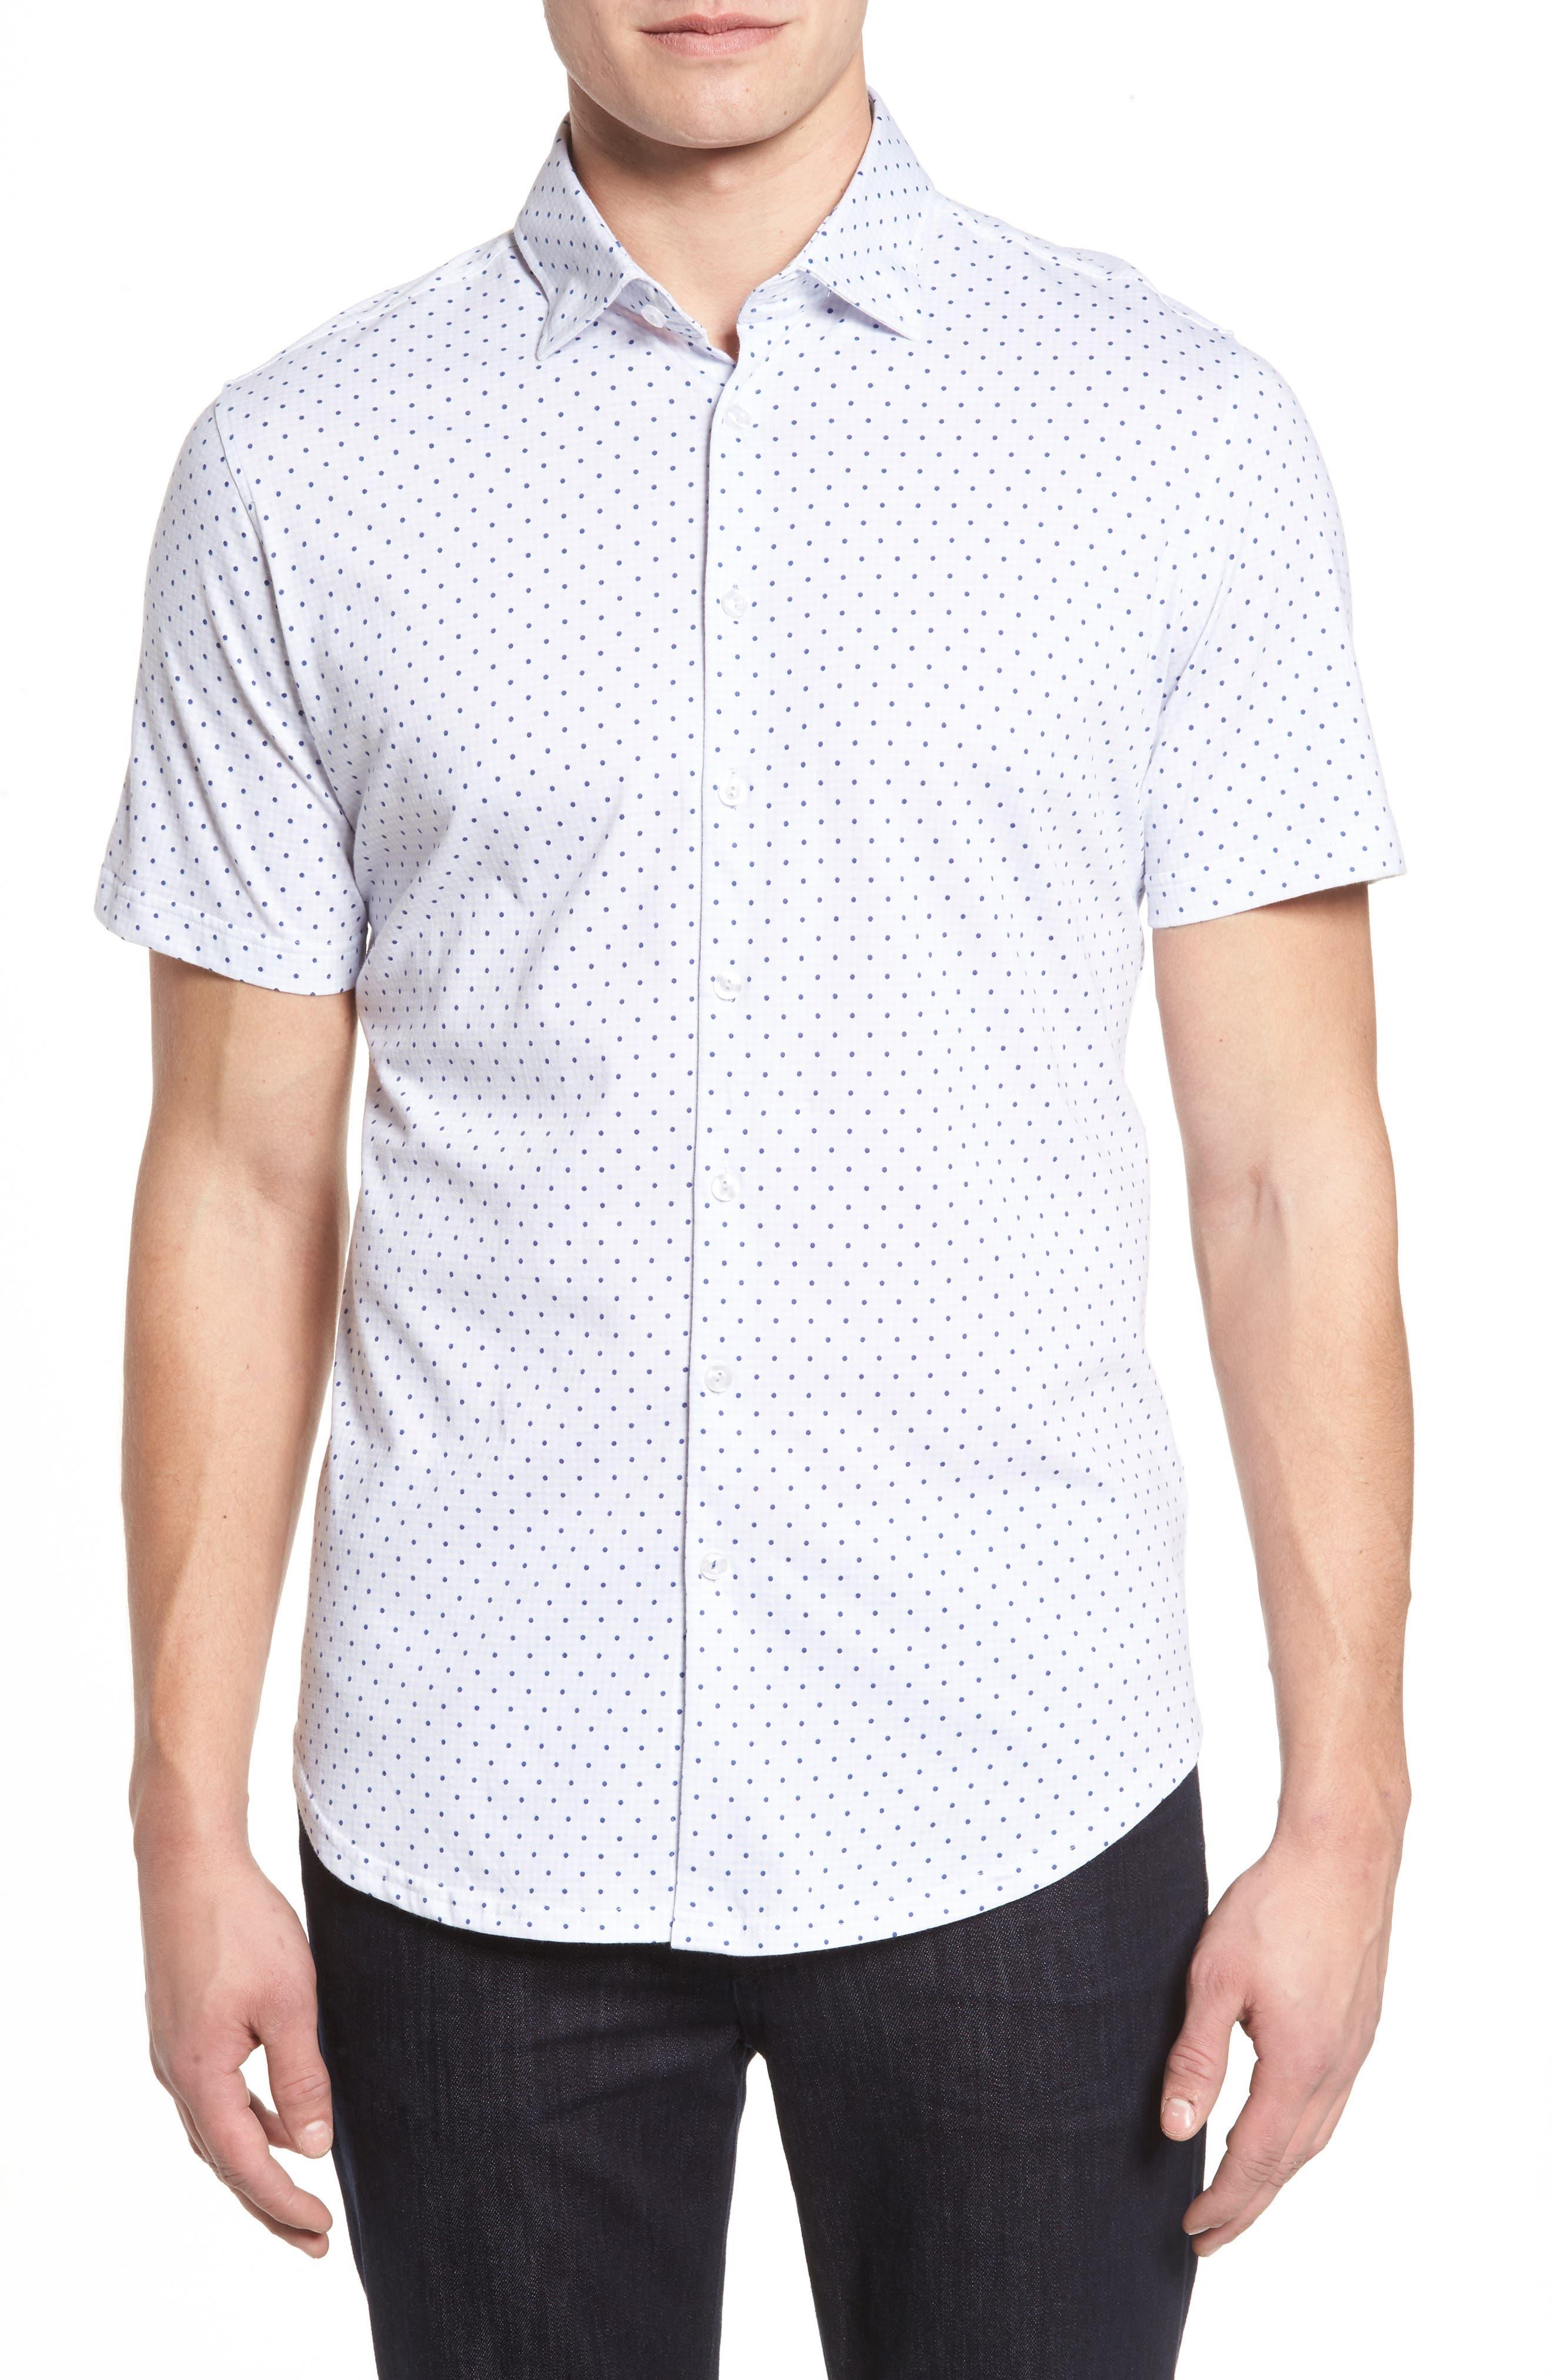 Alternate Image 1 Selected - Stone Rose Trim Fit Polka Dot Check Sport Shirt